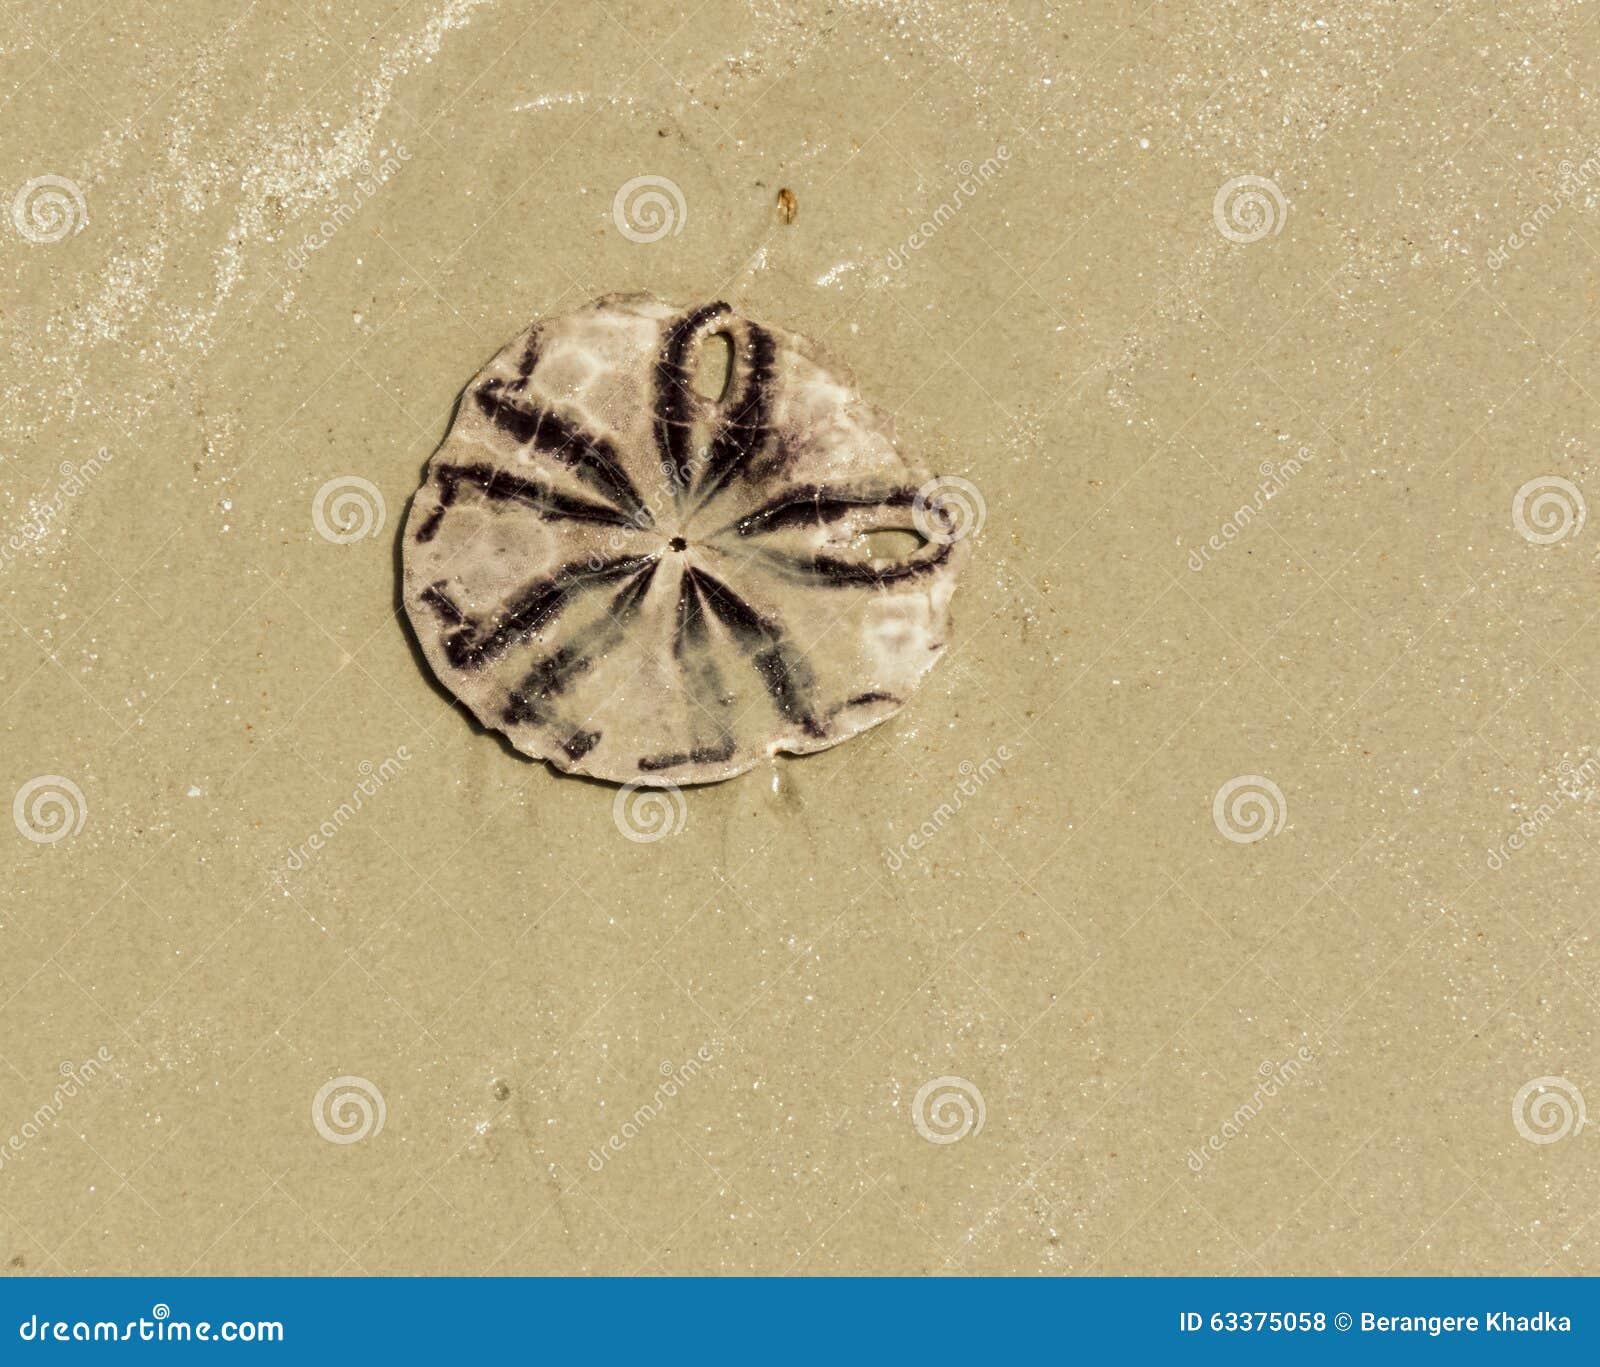 Sea cookie Sand Dollar